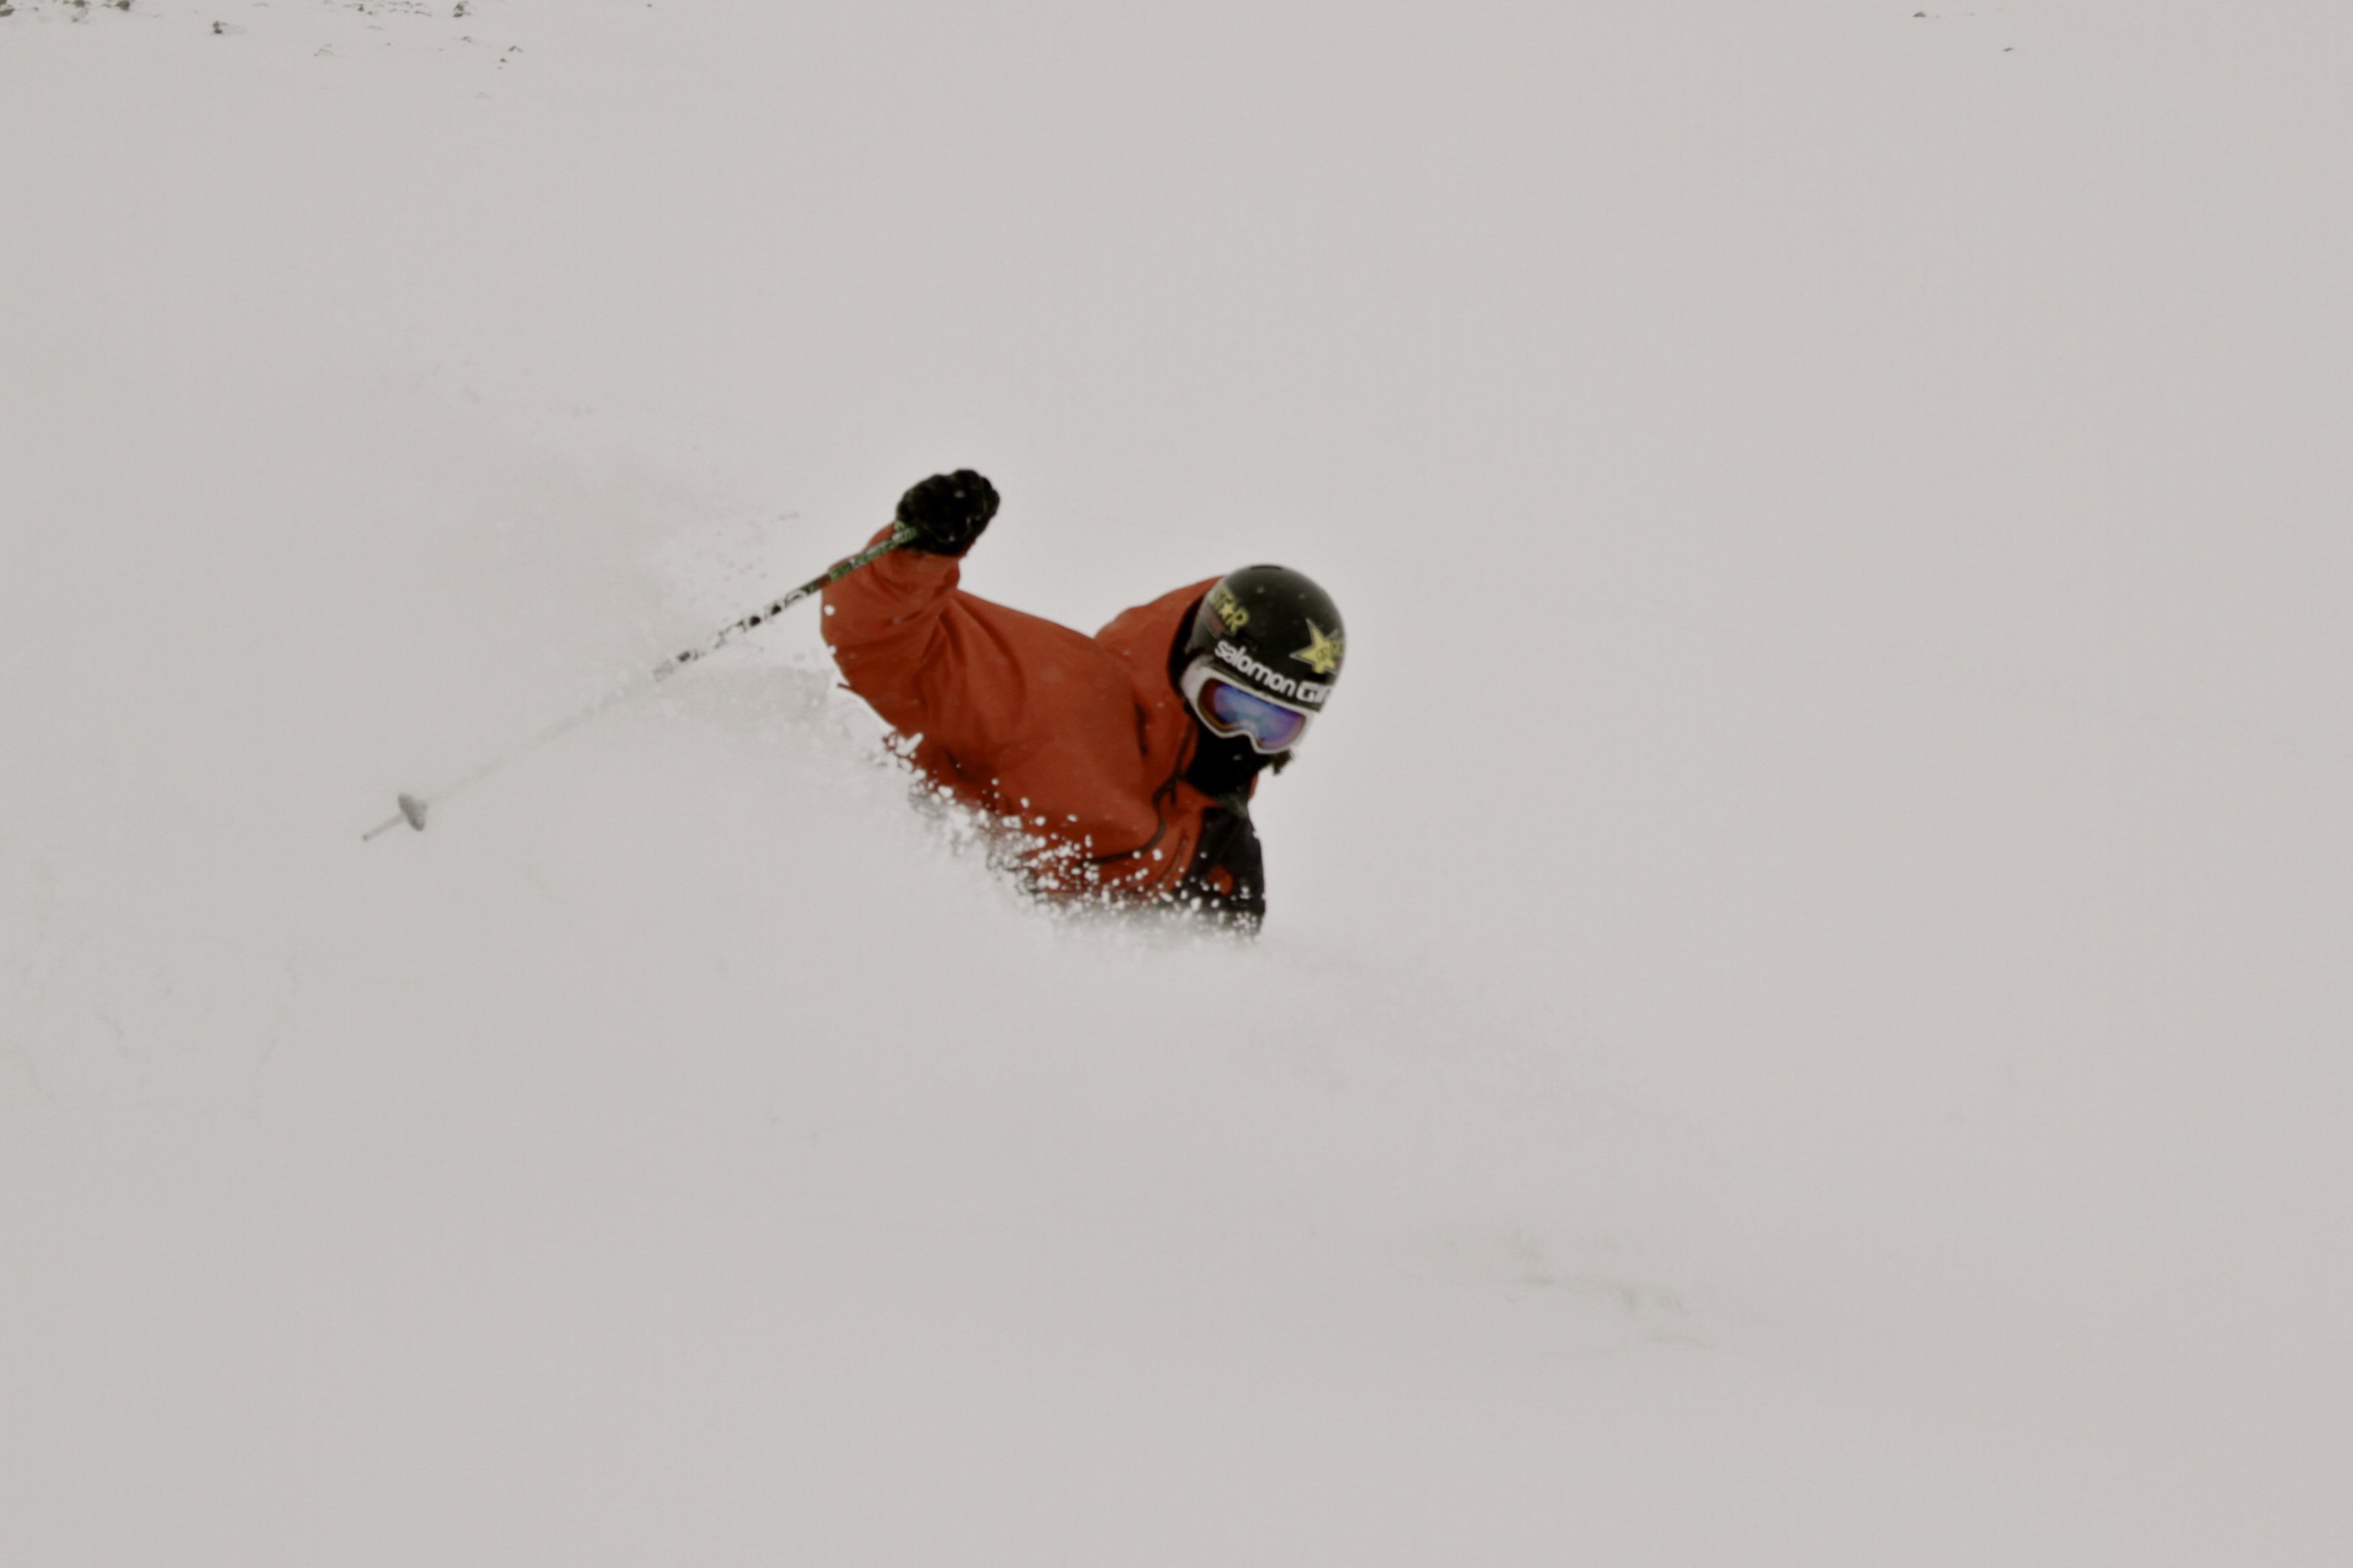 Nick Martini shredding deep Iceland powder